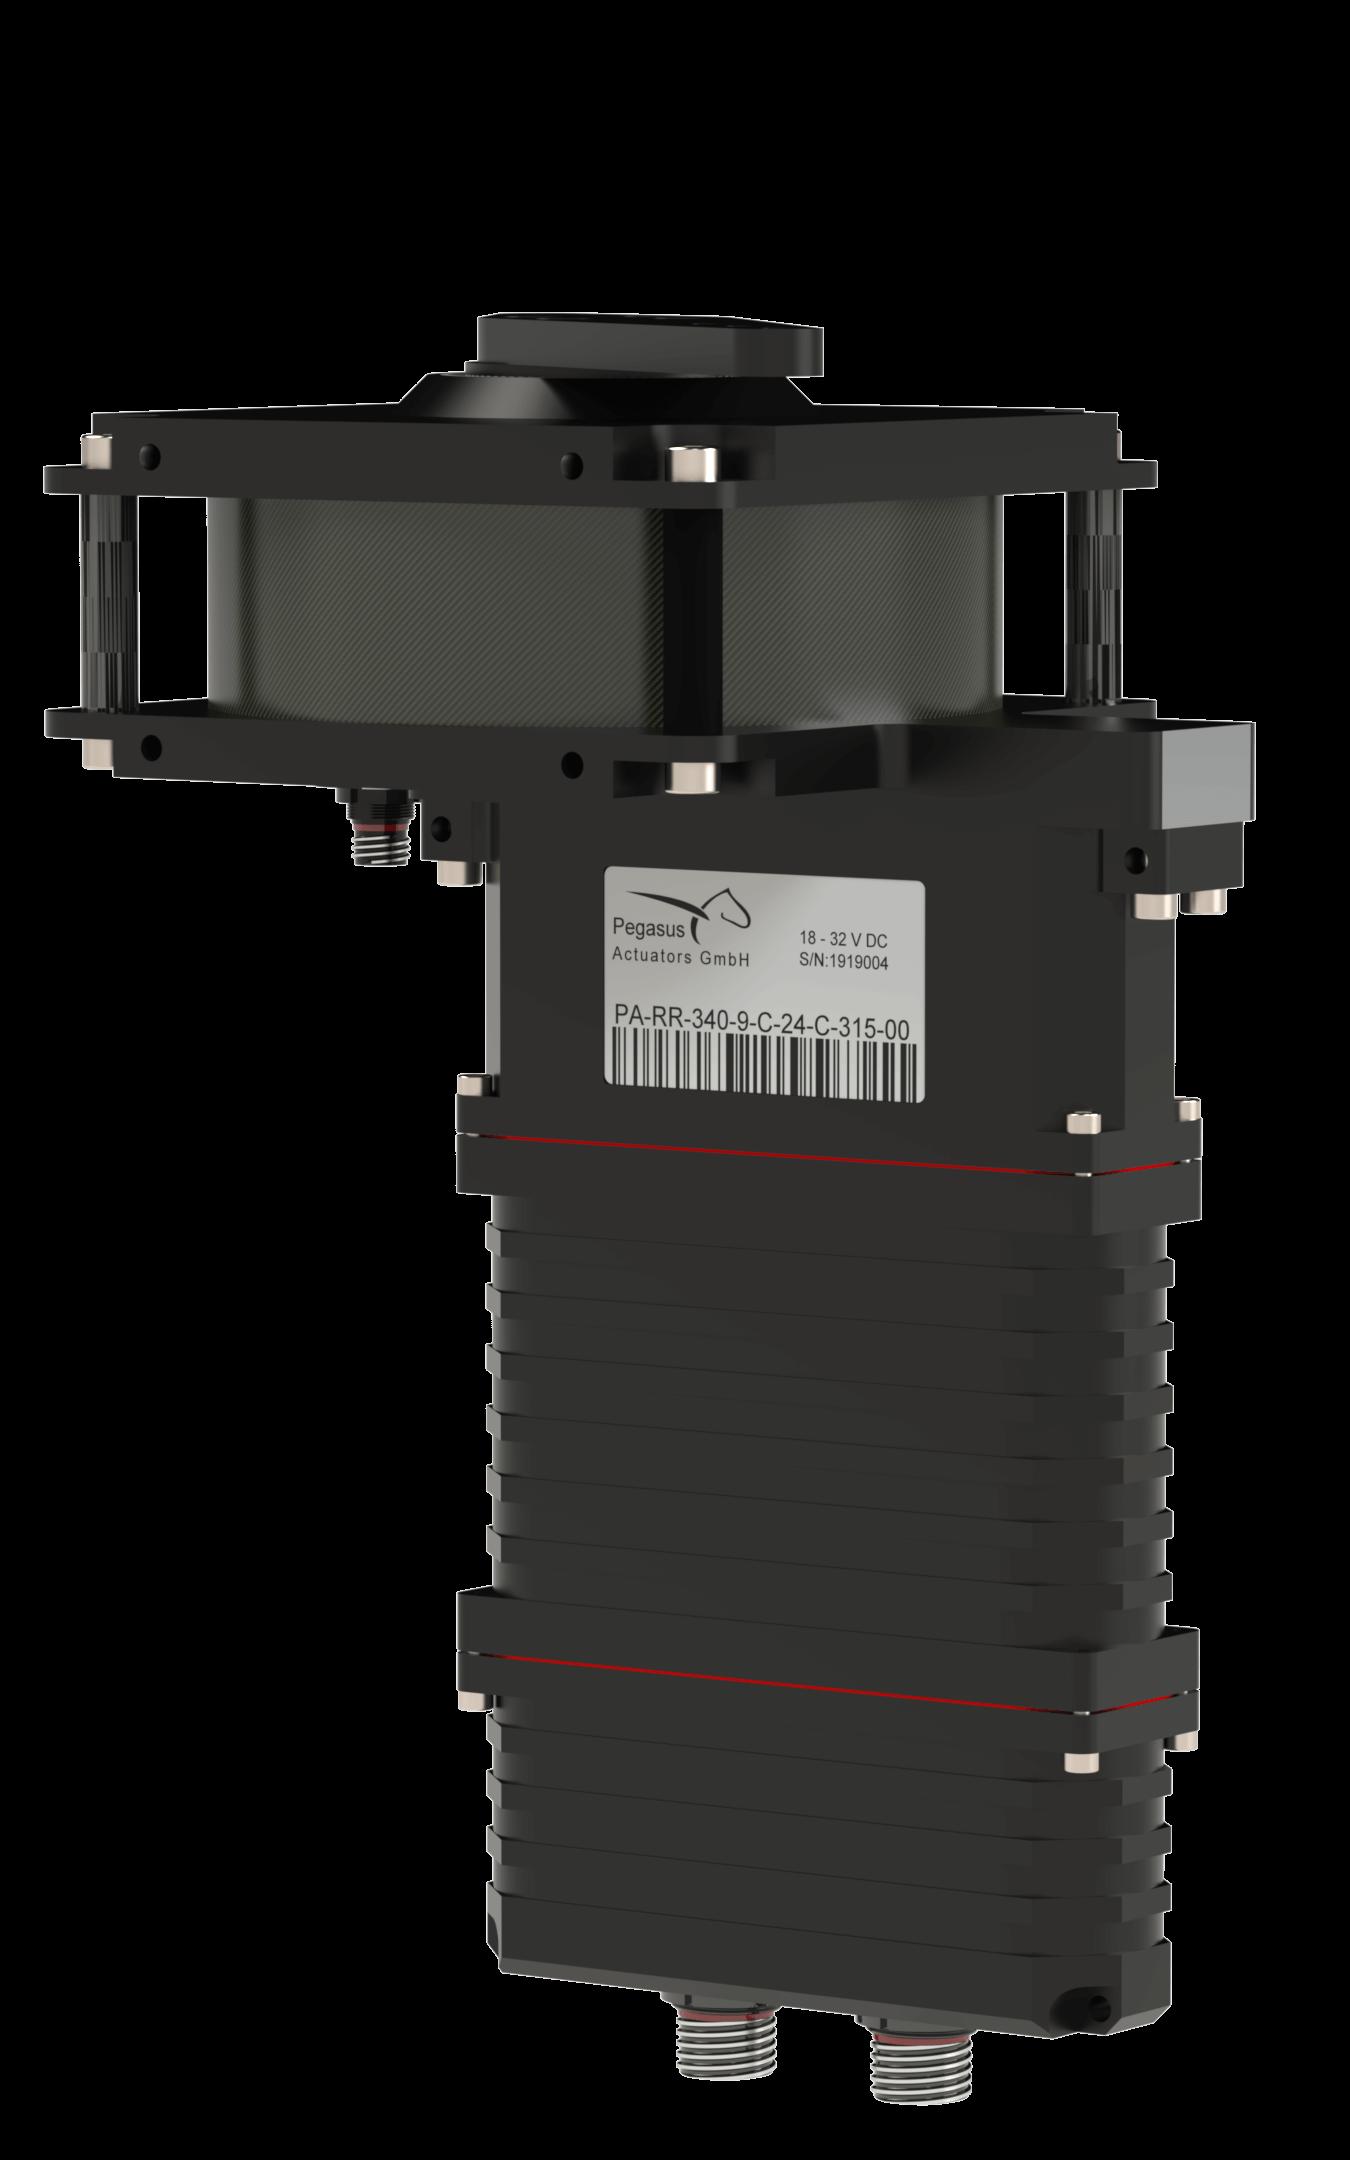 PA-RR-340-9-OPV Actuators